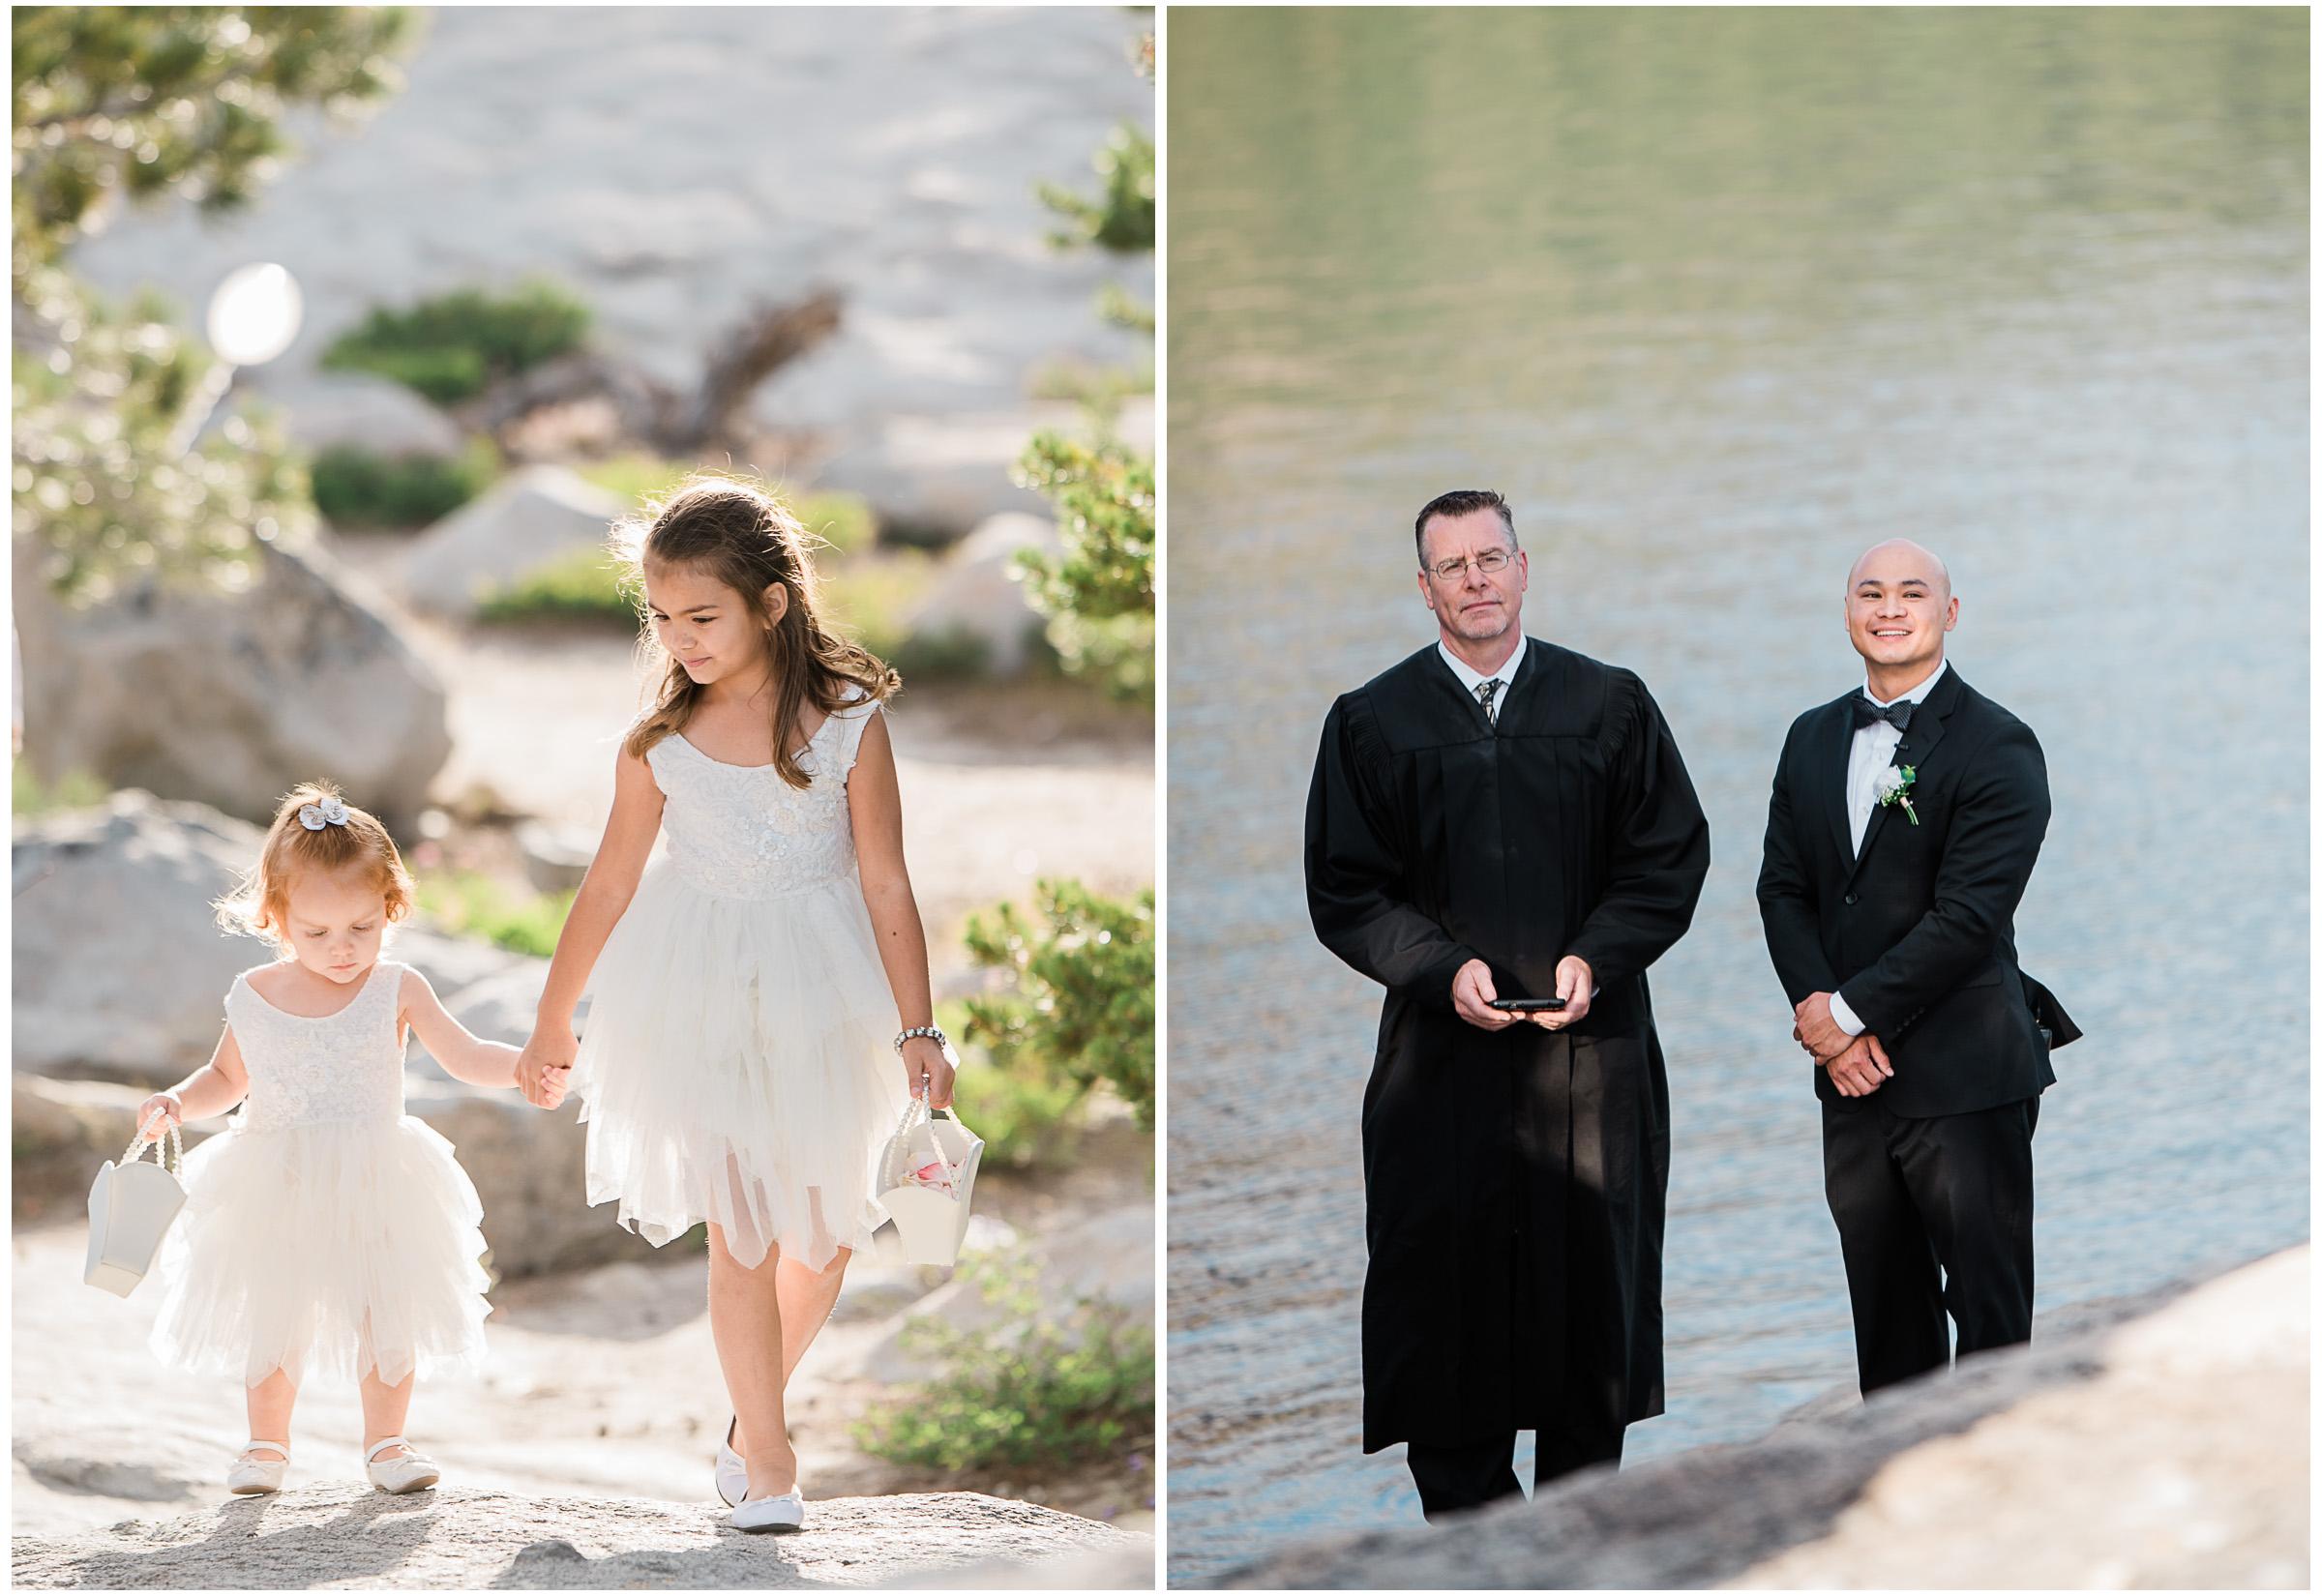 Clarksburg Wedding - Sacramento Photographer - Bogle Winery - Justin Wilcox Photography - 5.jpg